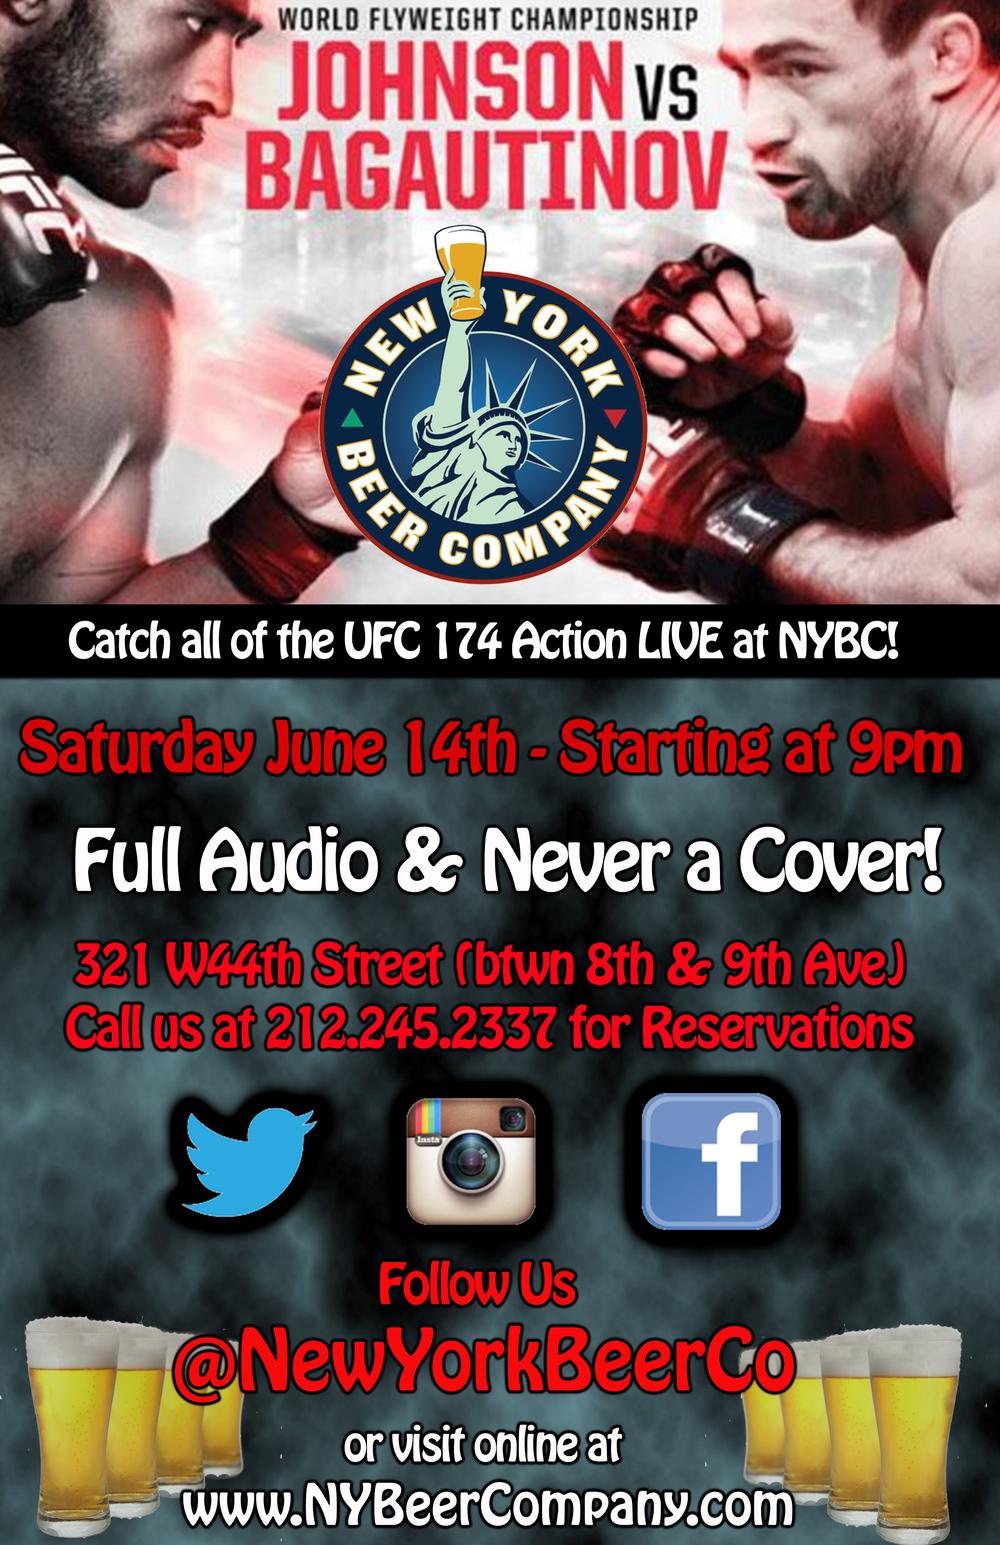 UFC 174 Flyer - NYBC - JPG.jpg